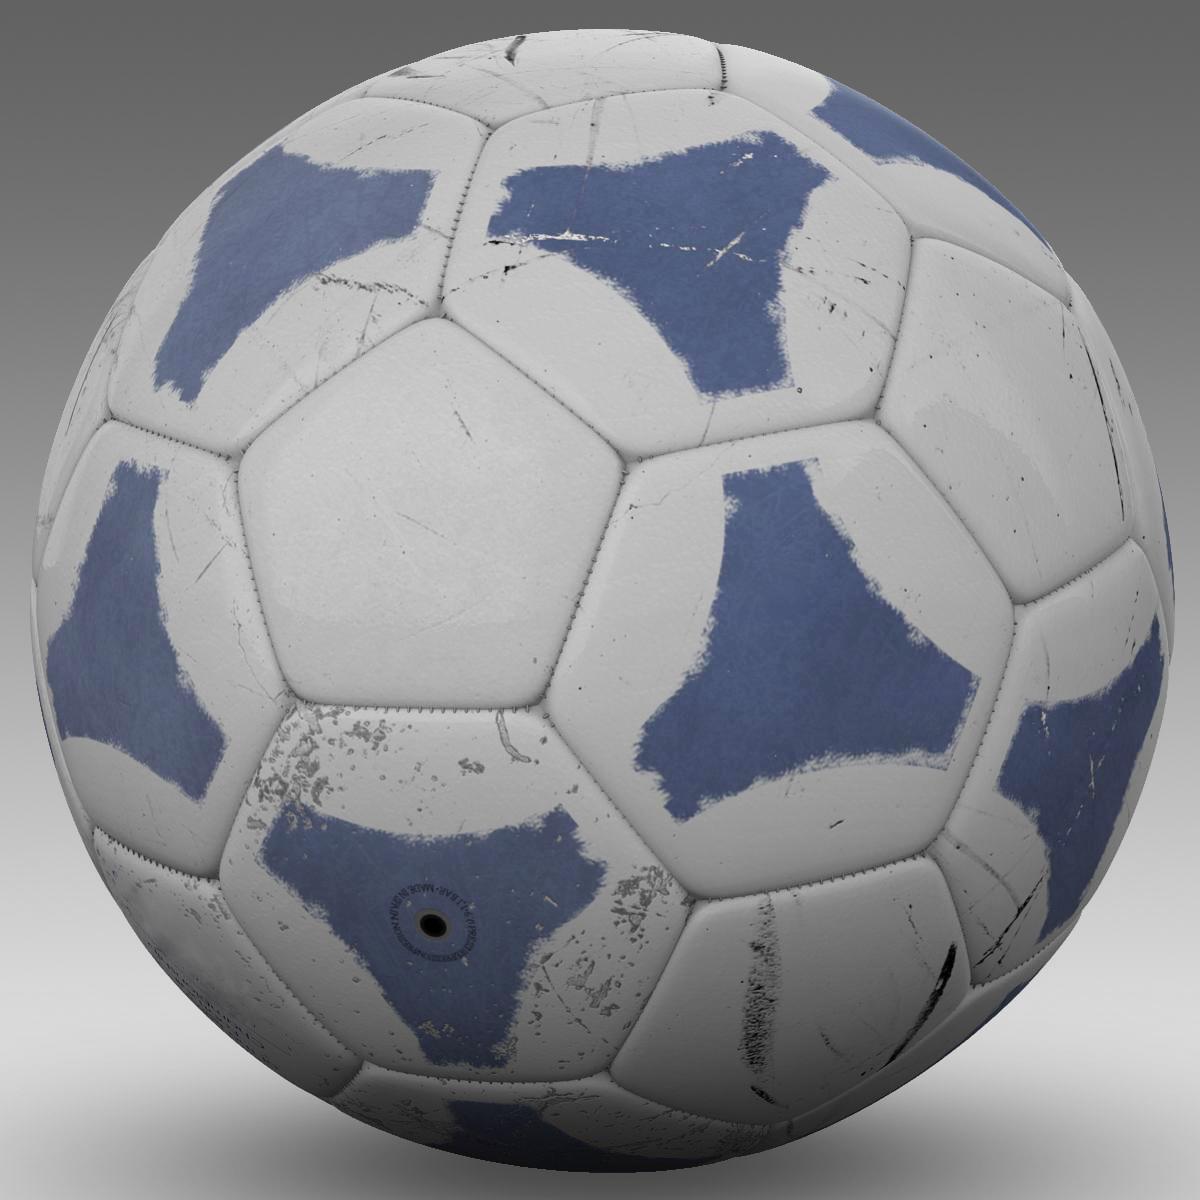 soccerball цэнхэр цагаан 3d загвар 3ds max fbx c4d ma mb obj 203987